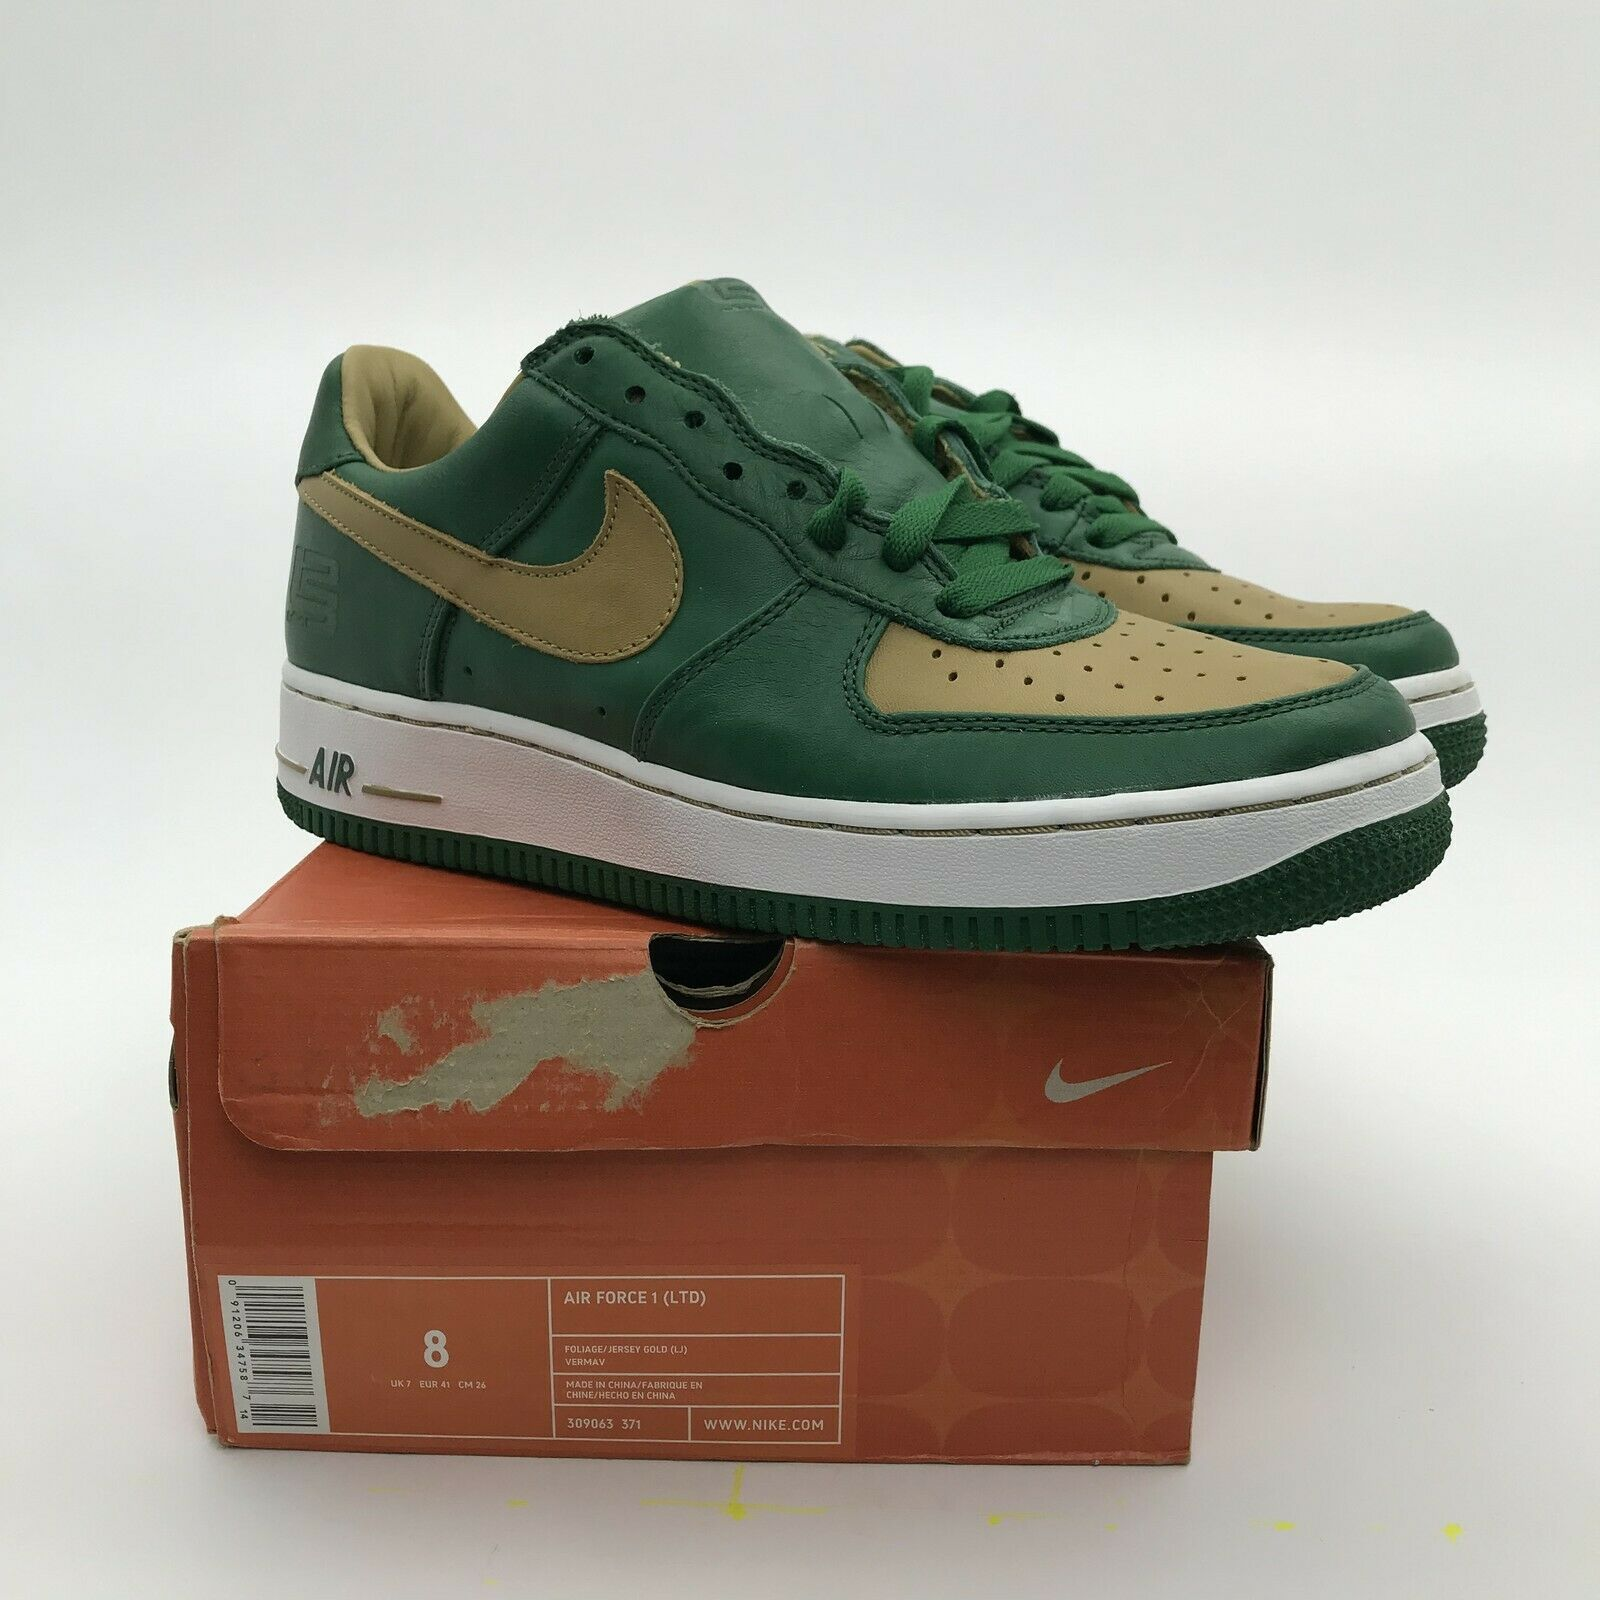 2003 Nike Air Force 1 Low LIMITED Lebron James  SVSM  309063-371 Men NEW US 8